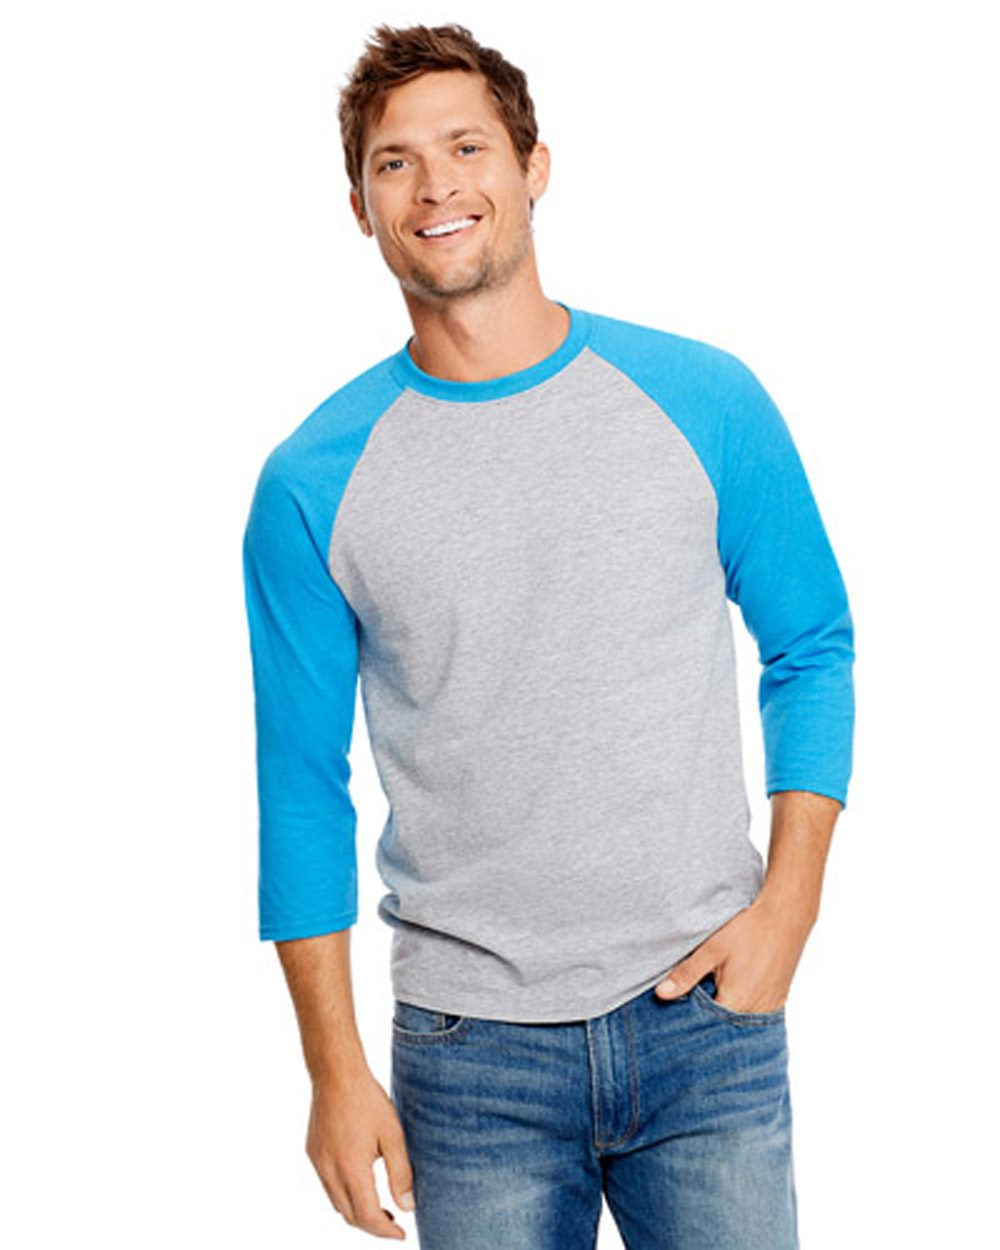 5aab5572 Hanes 42BA - X-Temp Three-Quarter Sleeve Baseball T-Shirt $6.68 ...